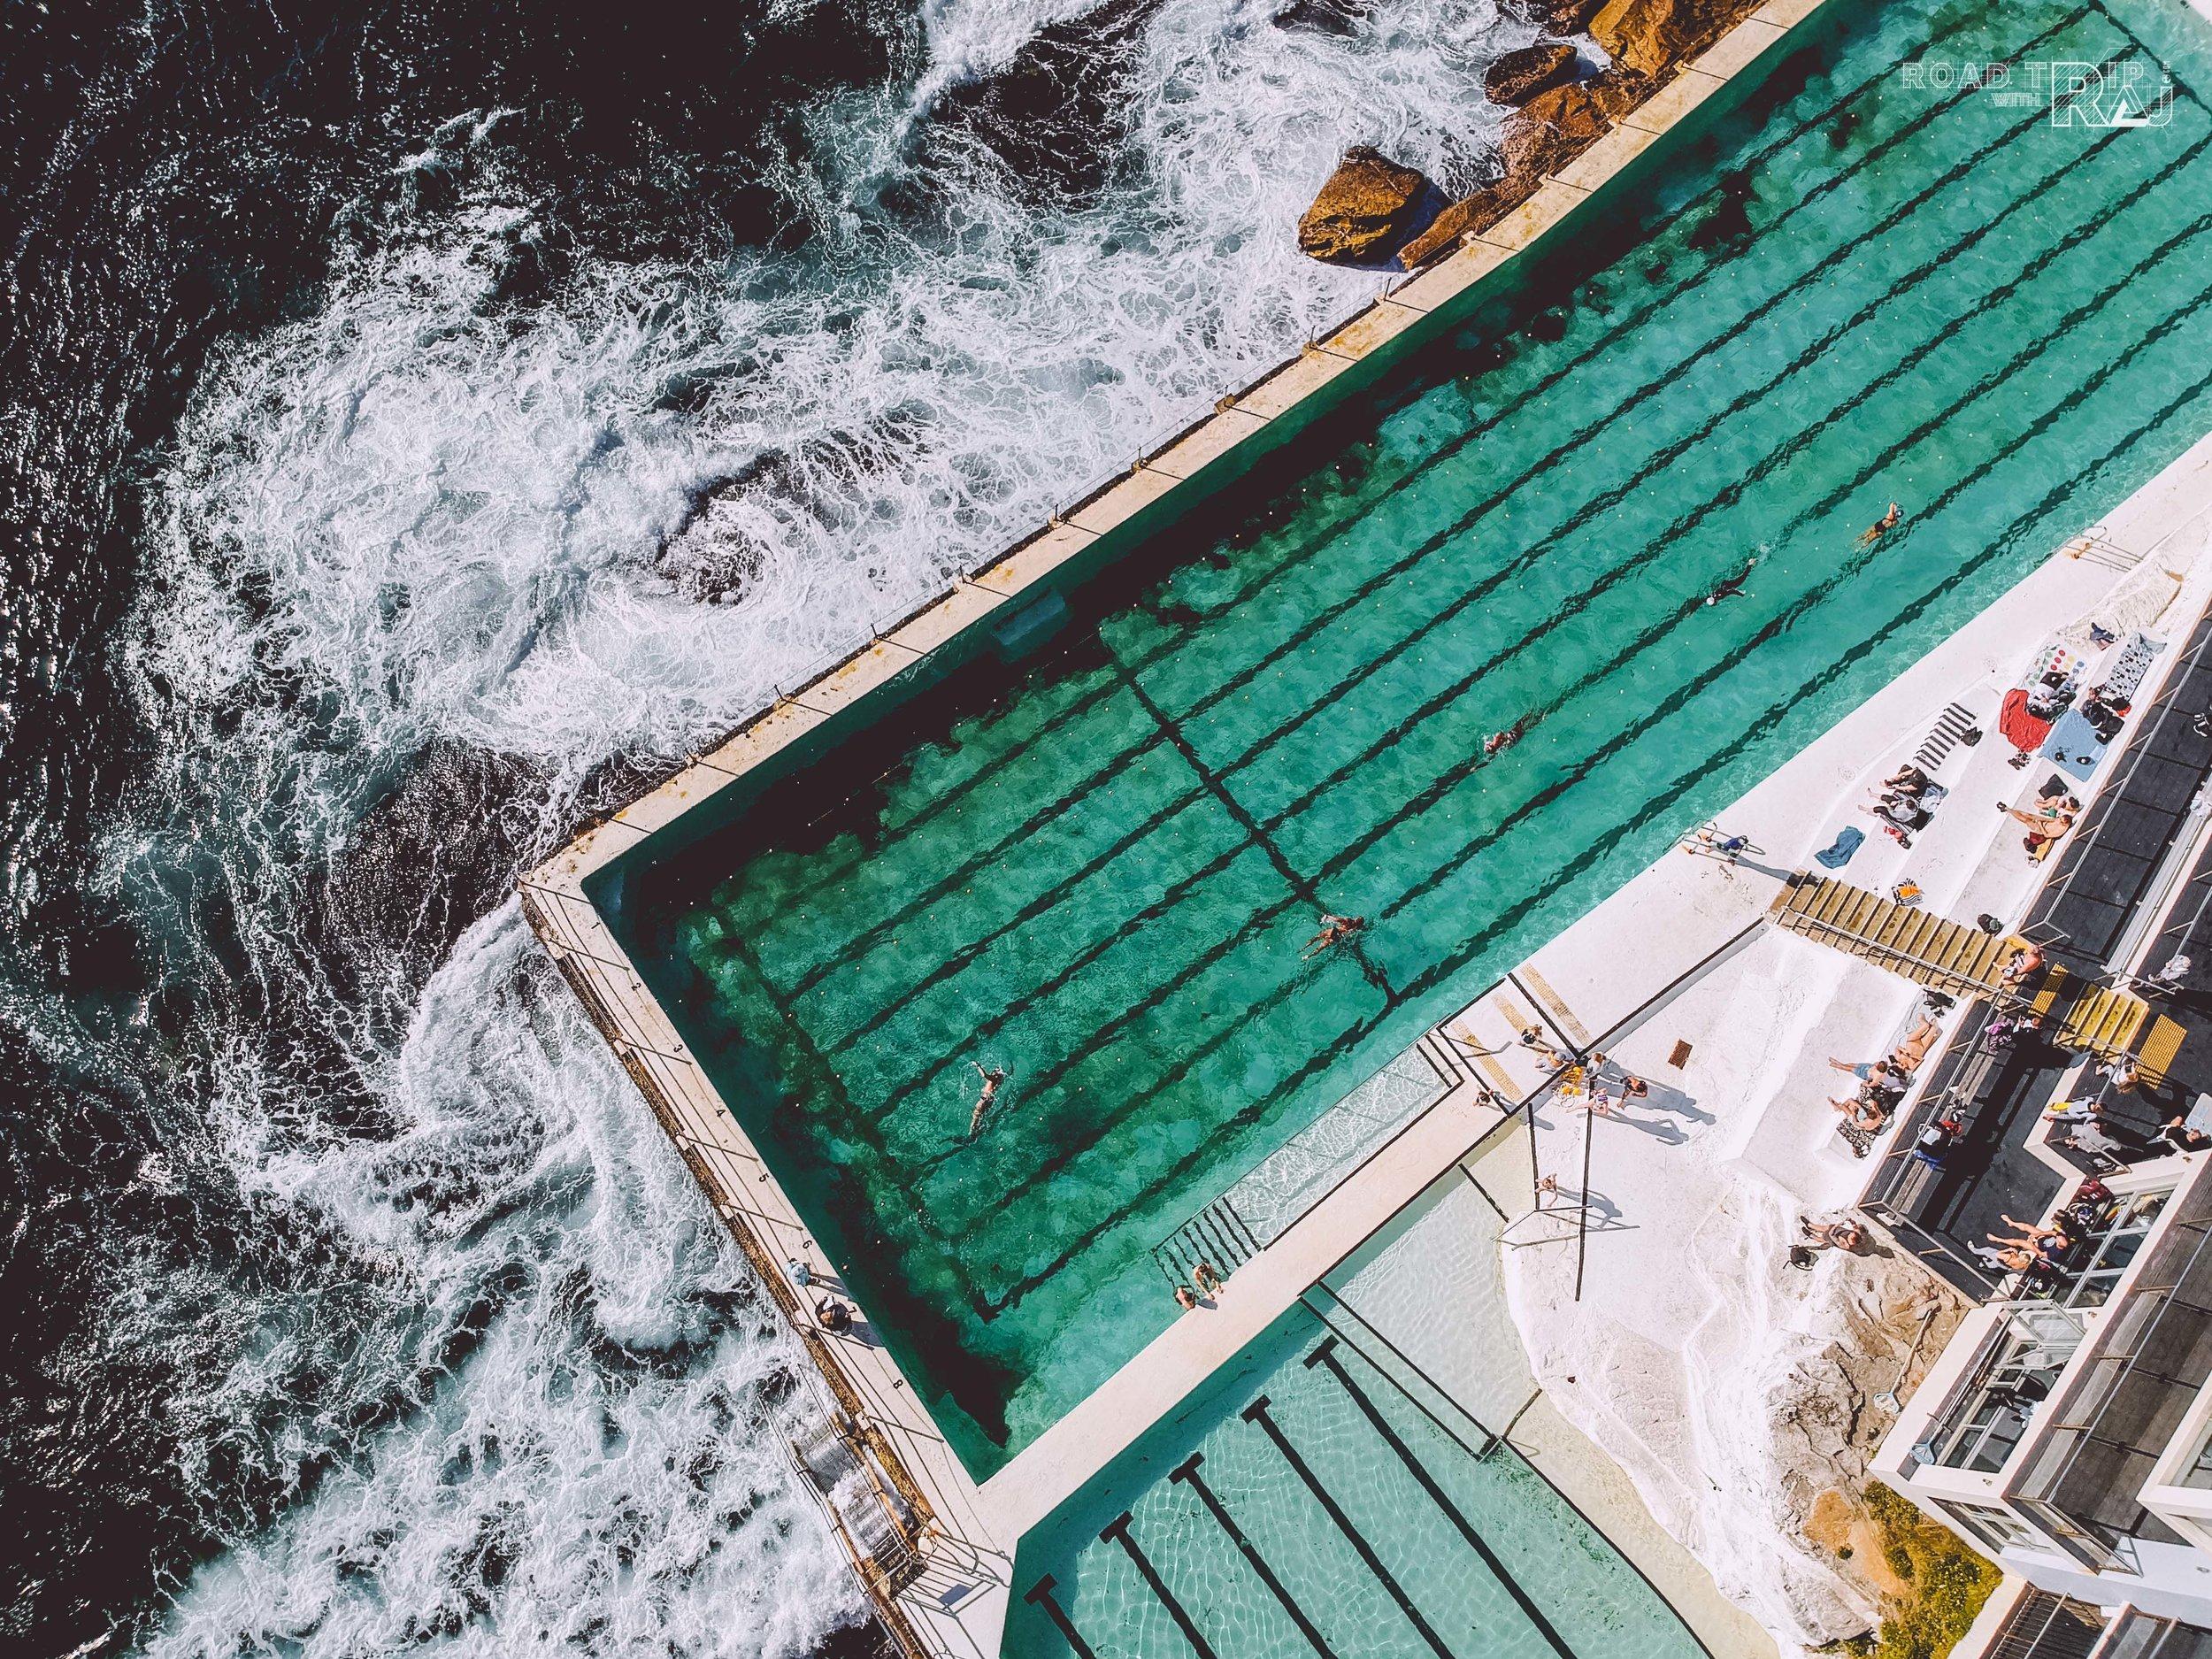 bondi-beach-from-the-above.jpg